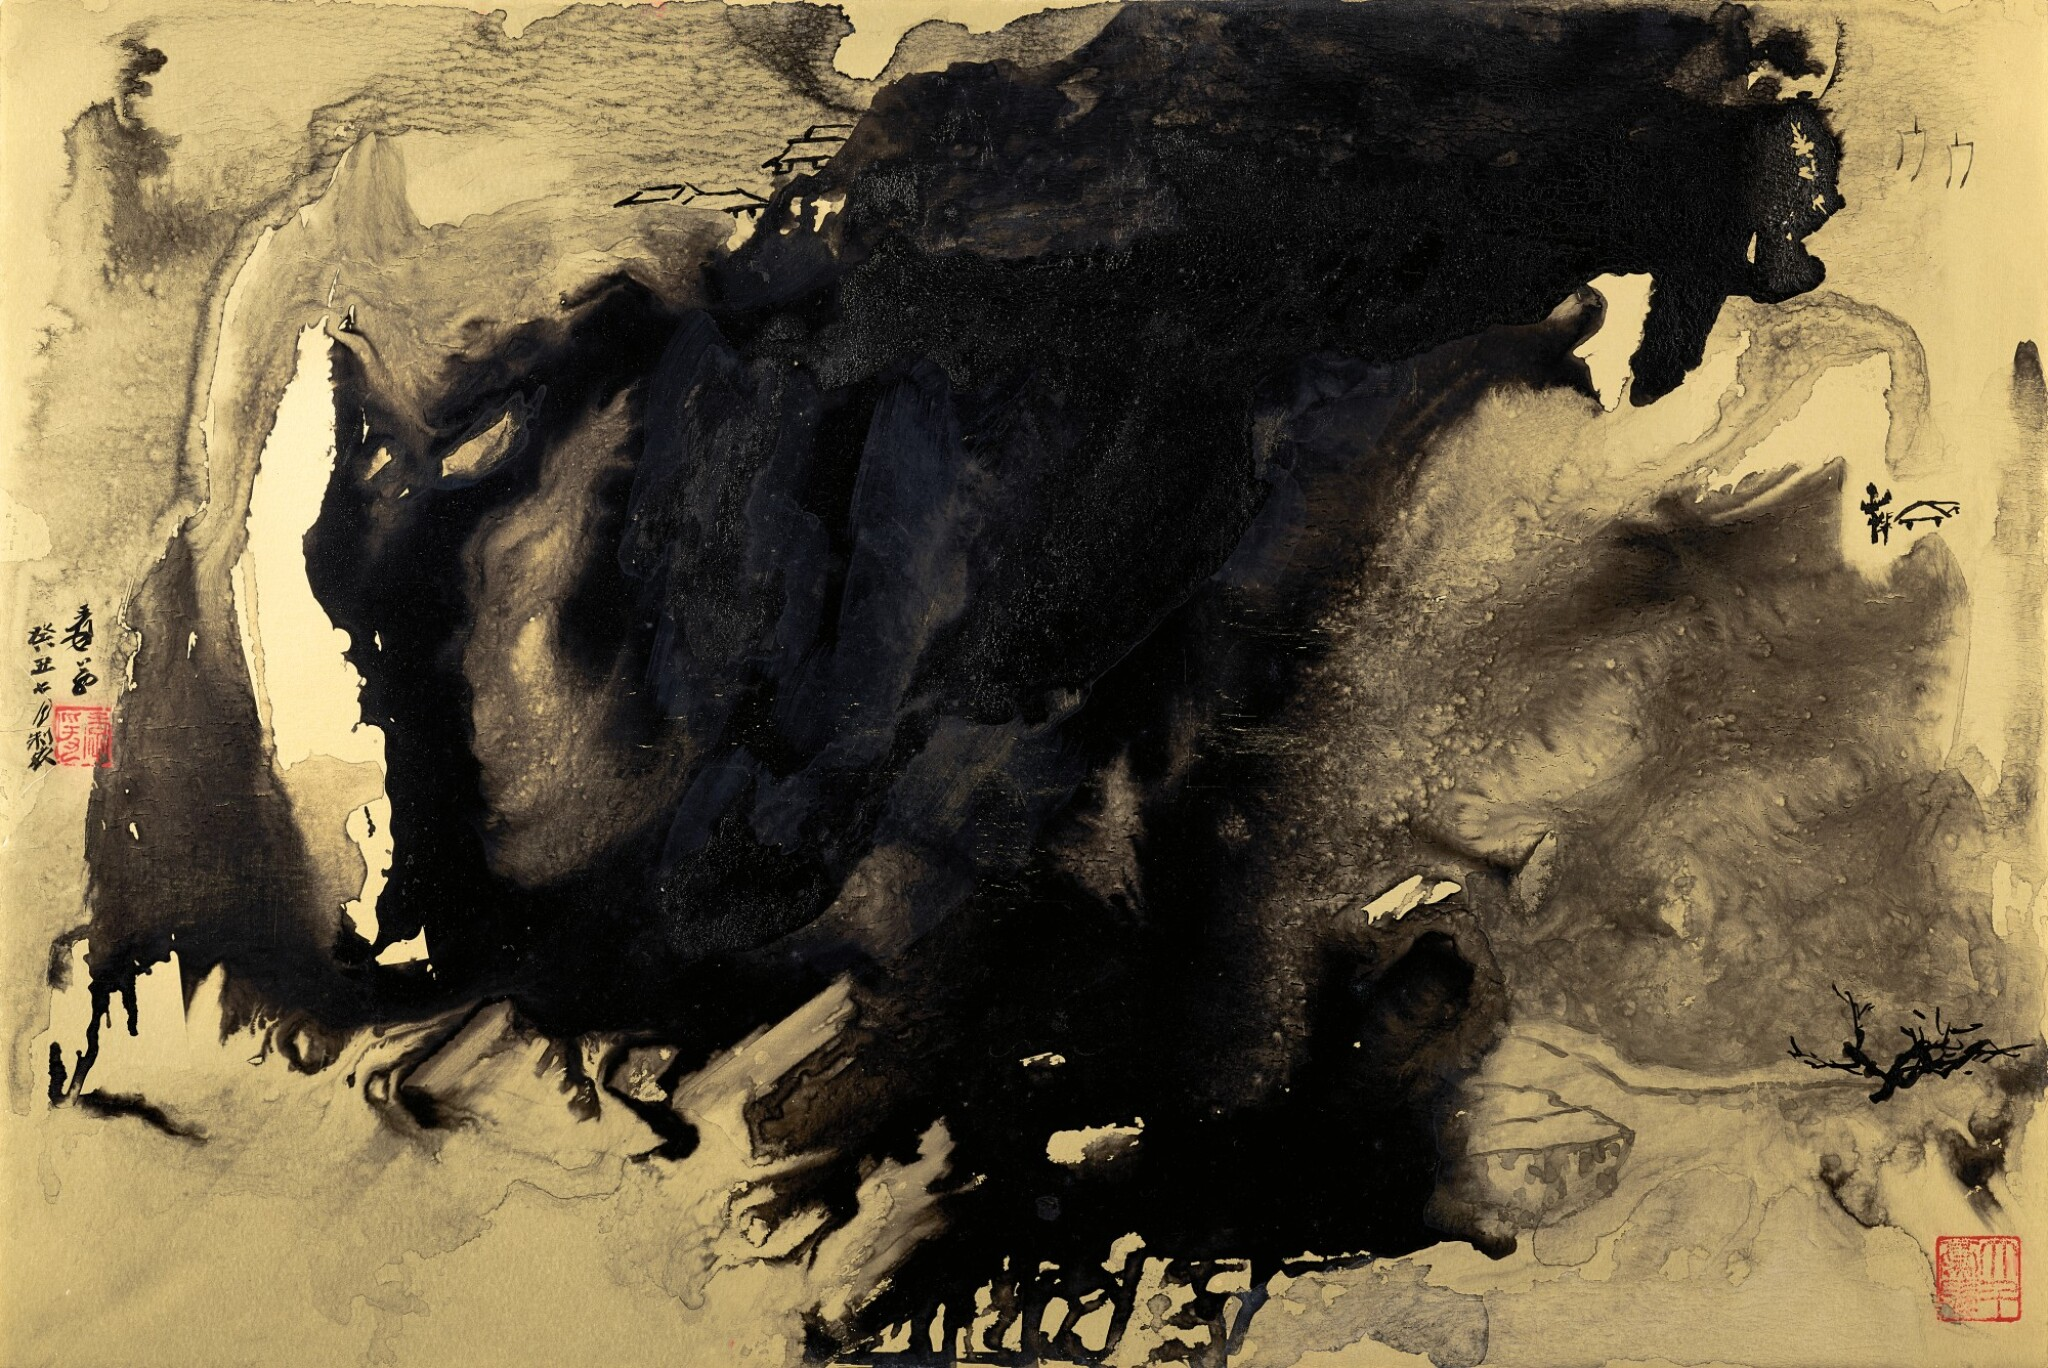 View full screen - View 1 of Lot 2571. Zhang Daqian (Chang Dai-Chien, 1899-1983) 張大千 (1899-1983)   Dwelling in the Misty Mountains 煙霞漫山居.